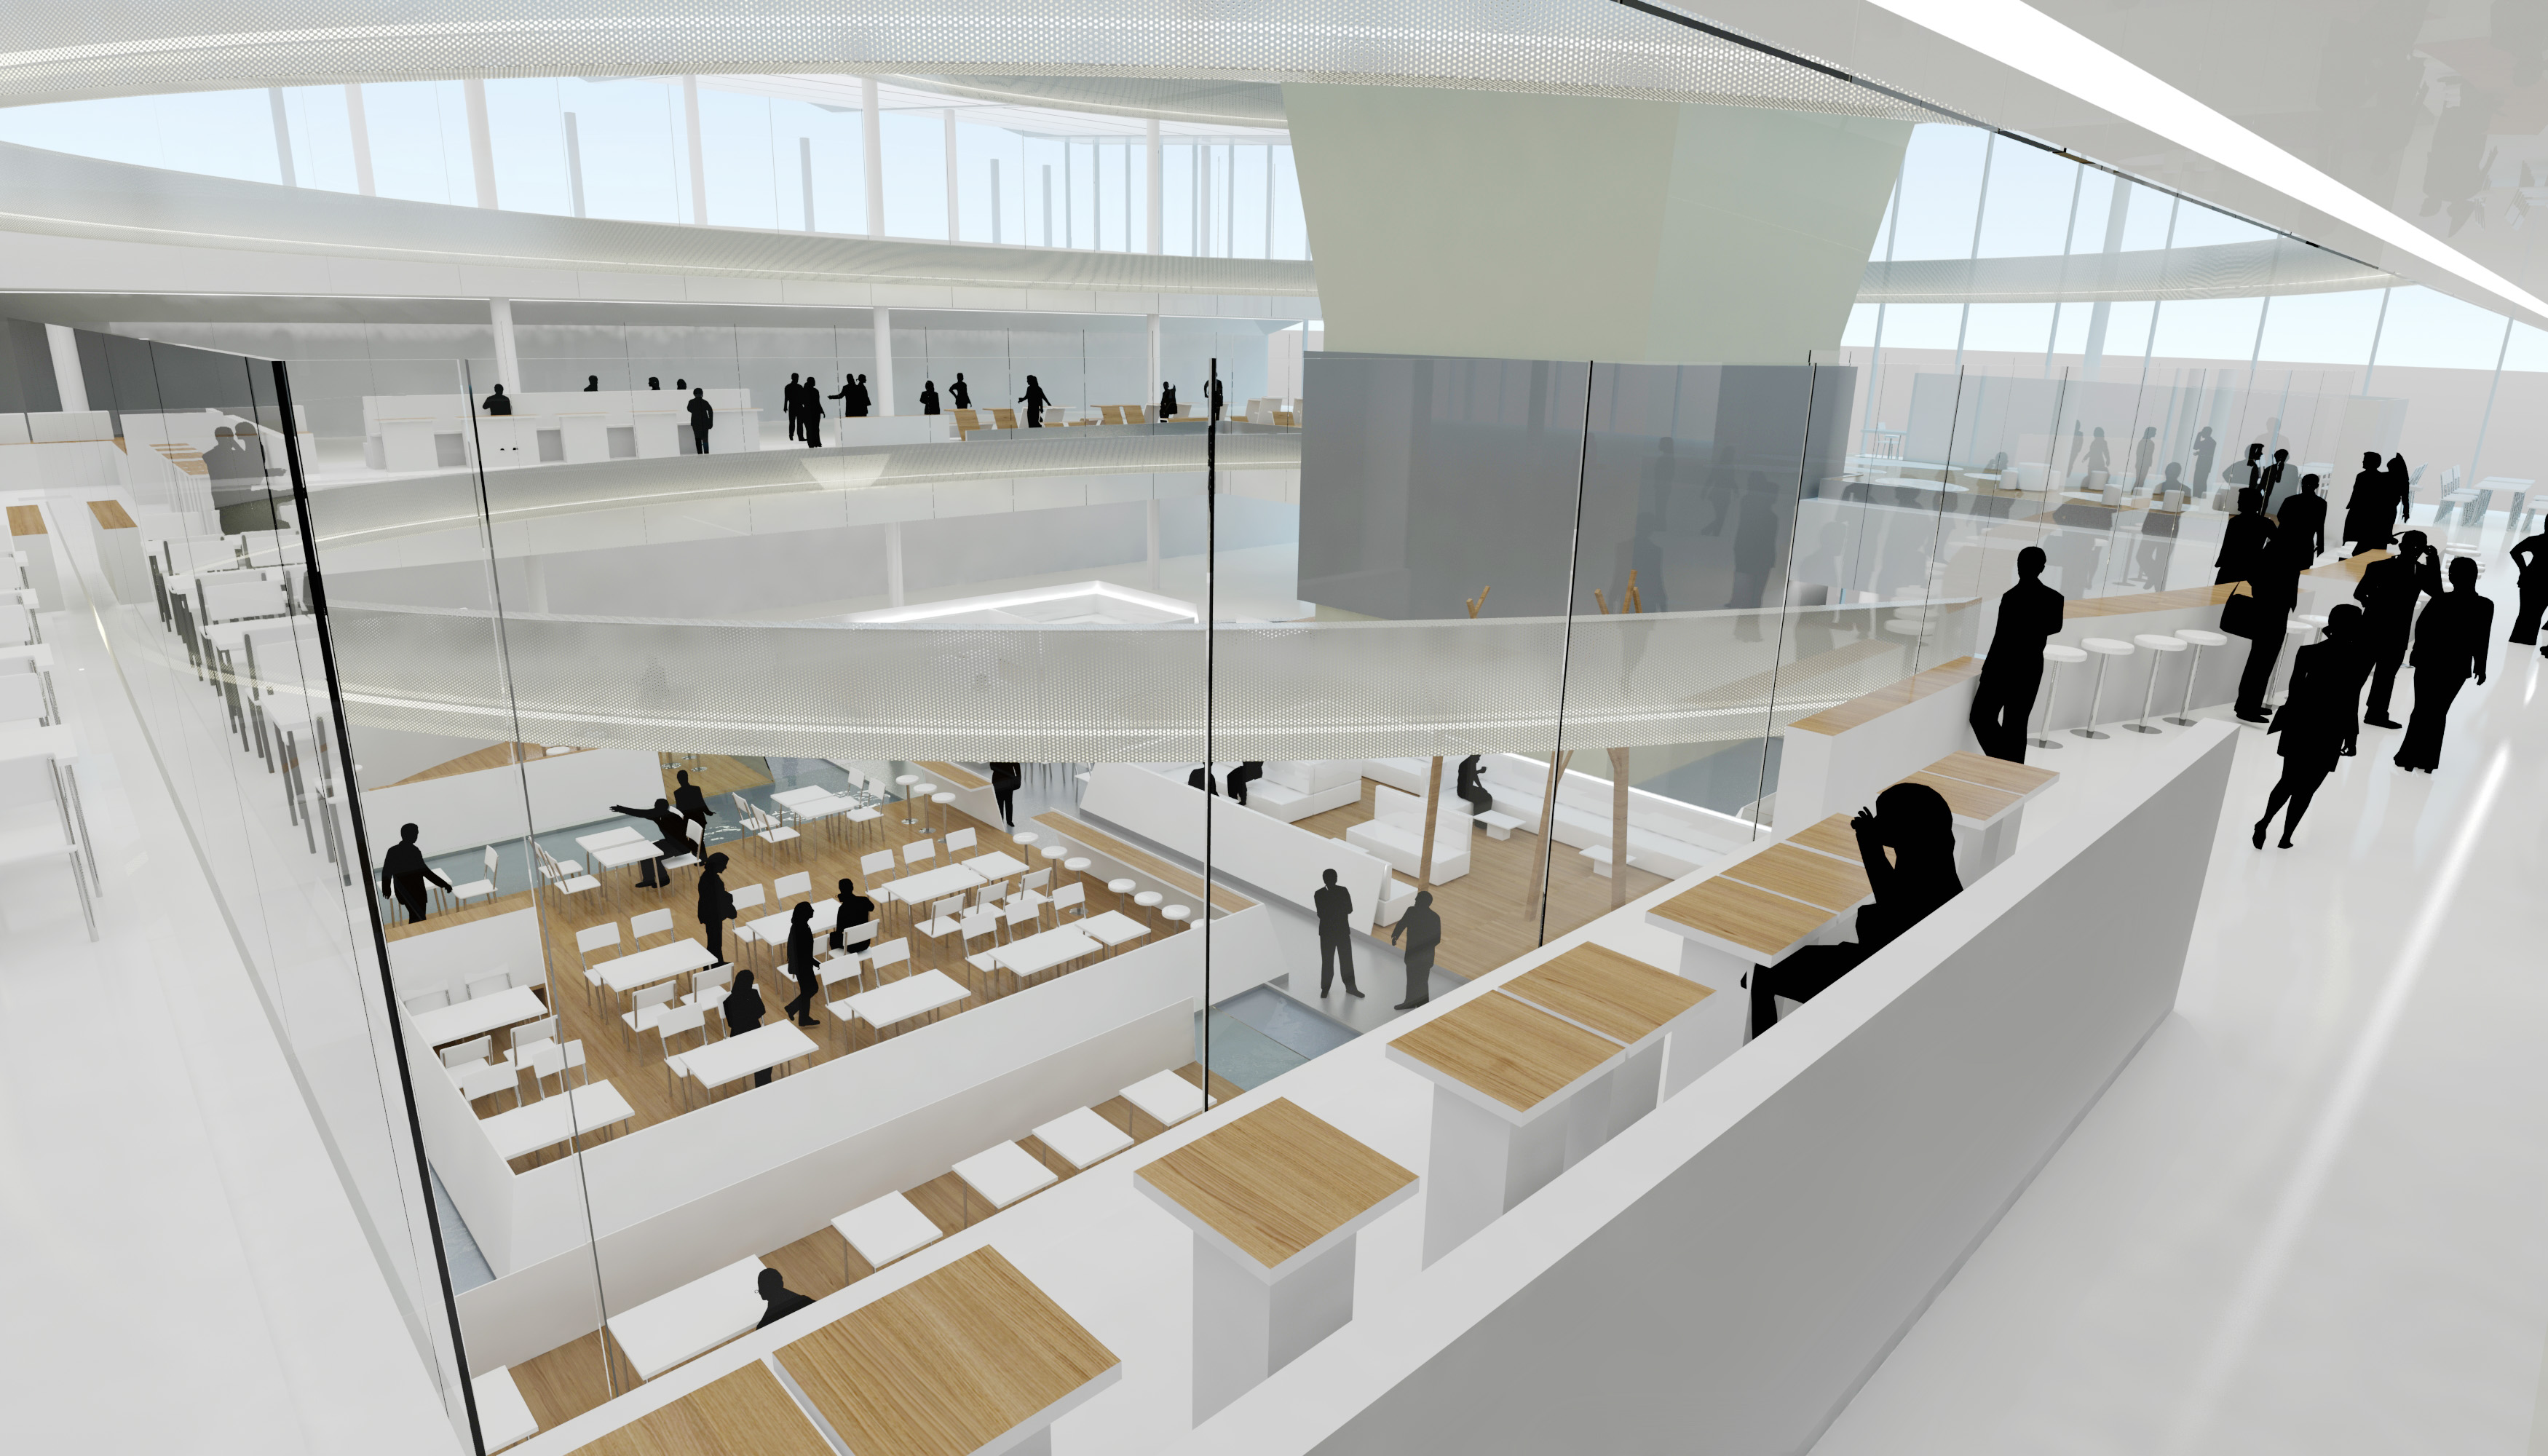 MUC Airport Terminal III